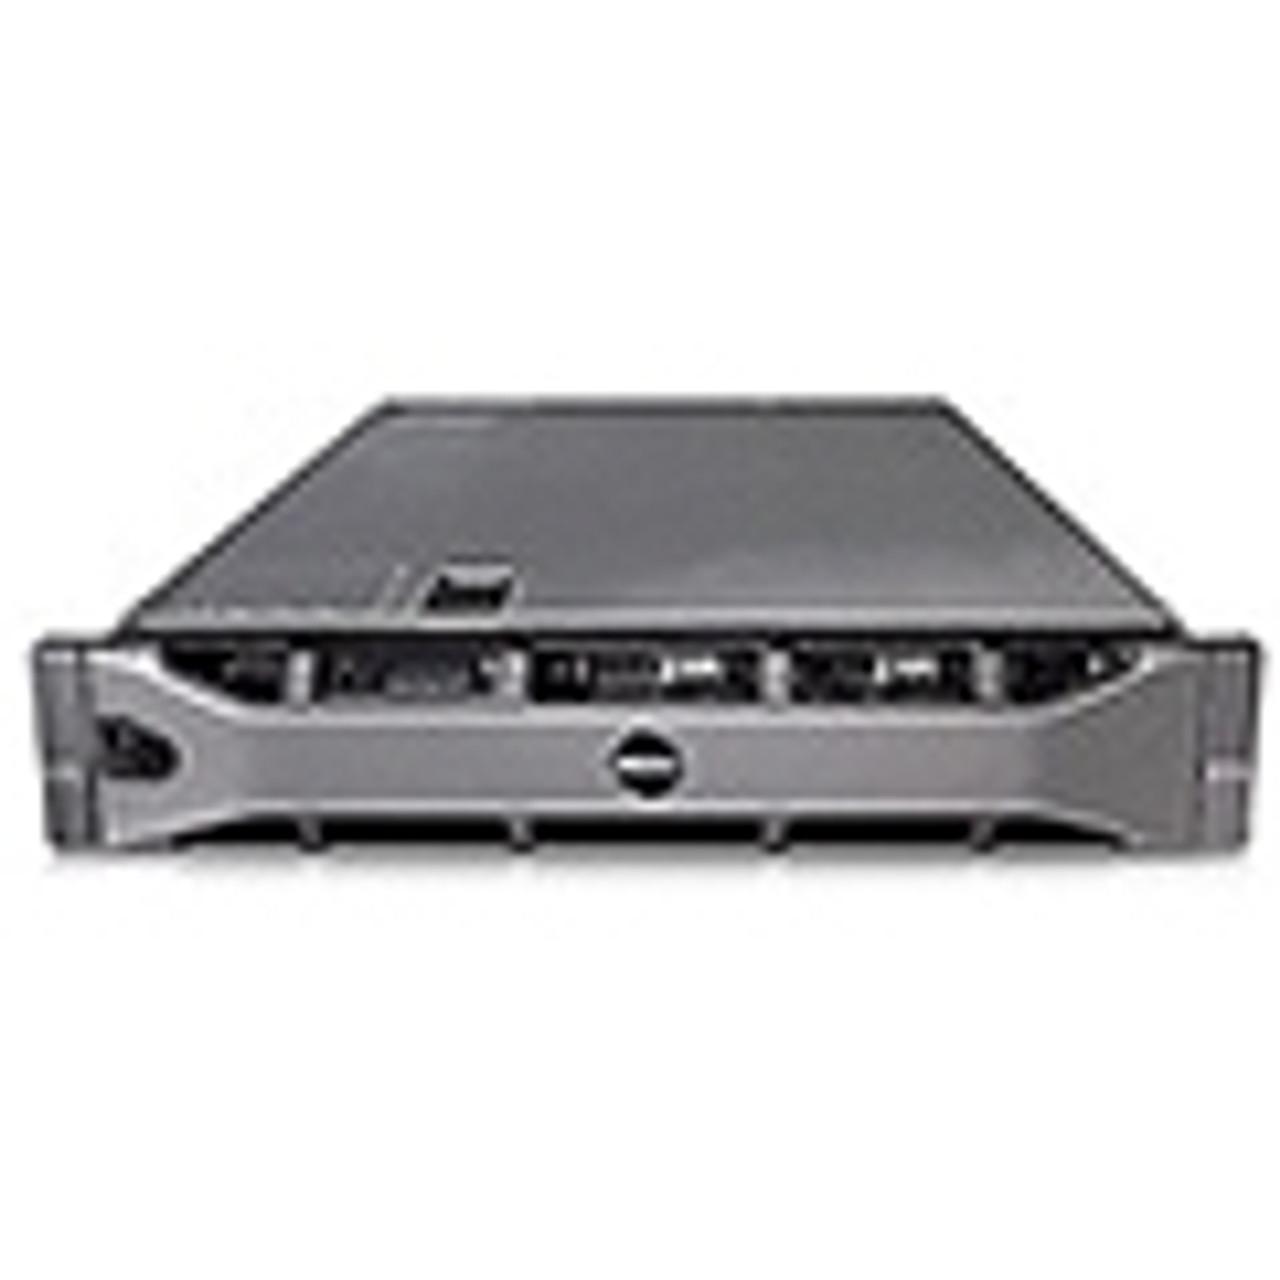 Dell PowerEdge R810 Servers